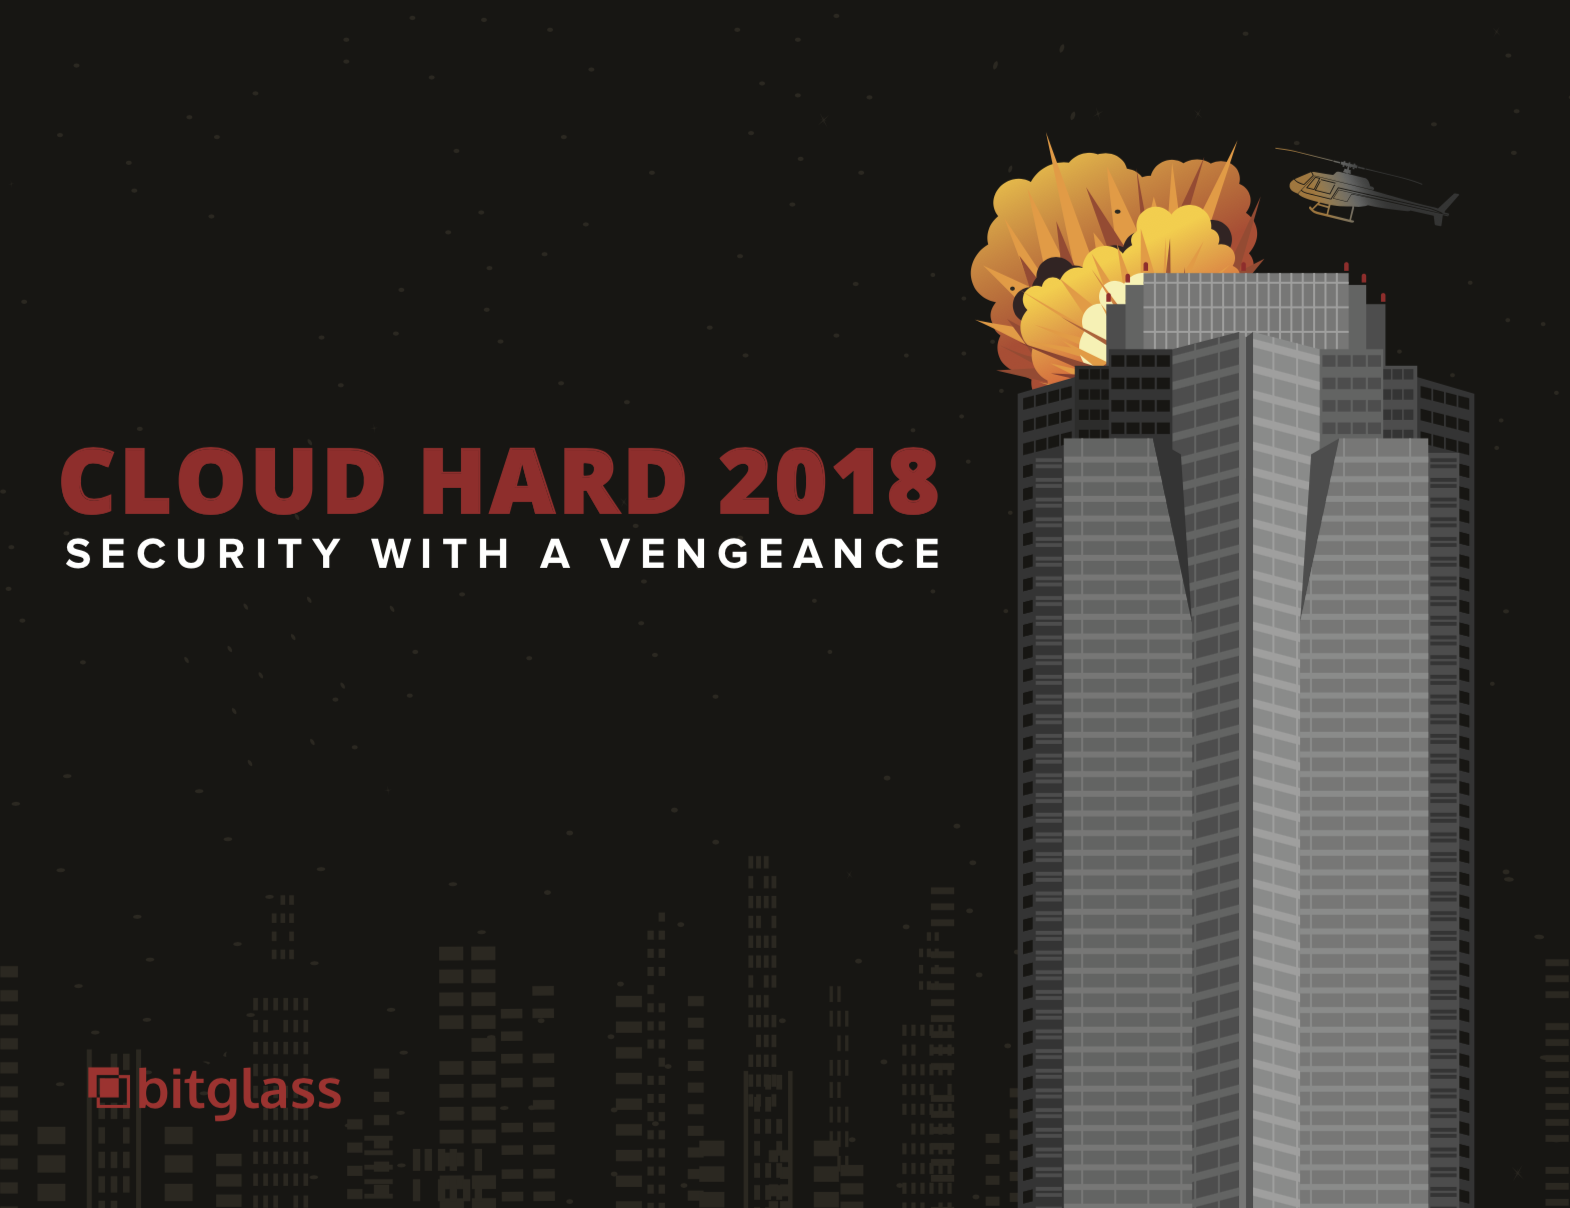 Cloud Hard 2018